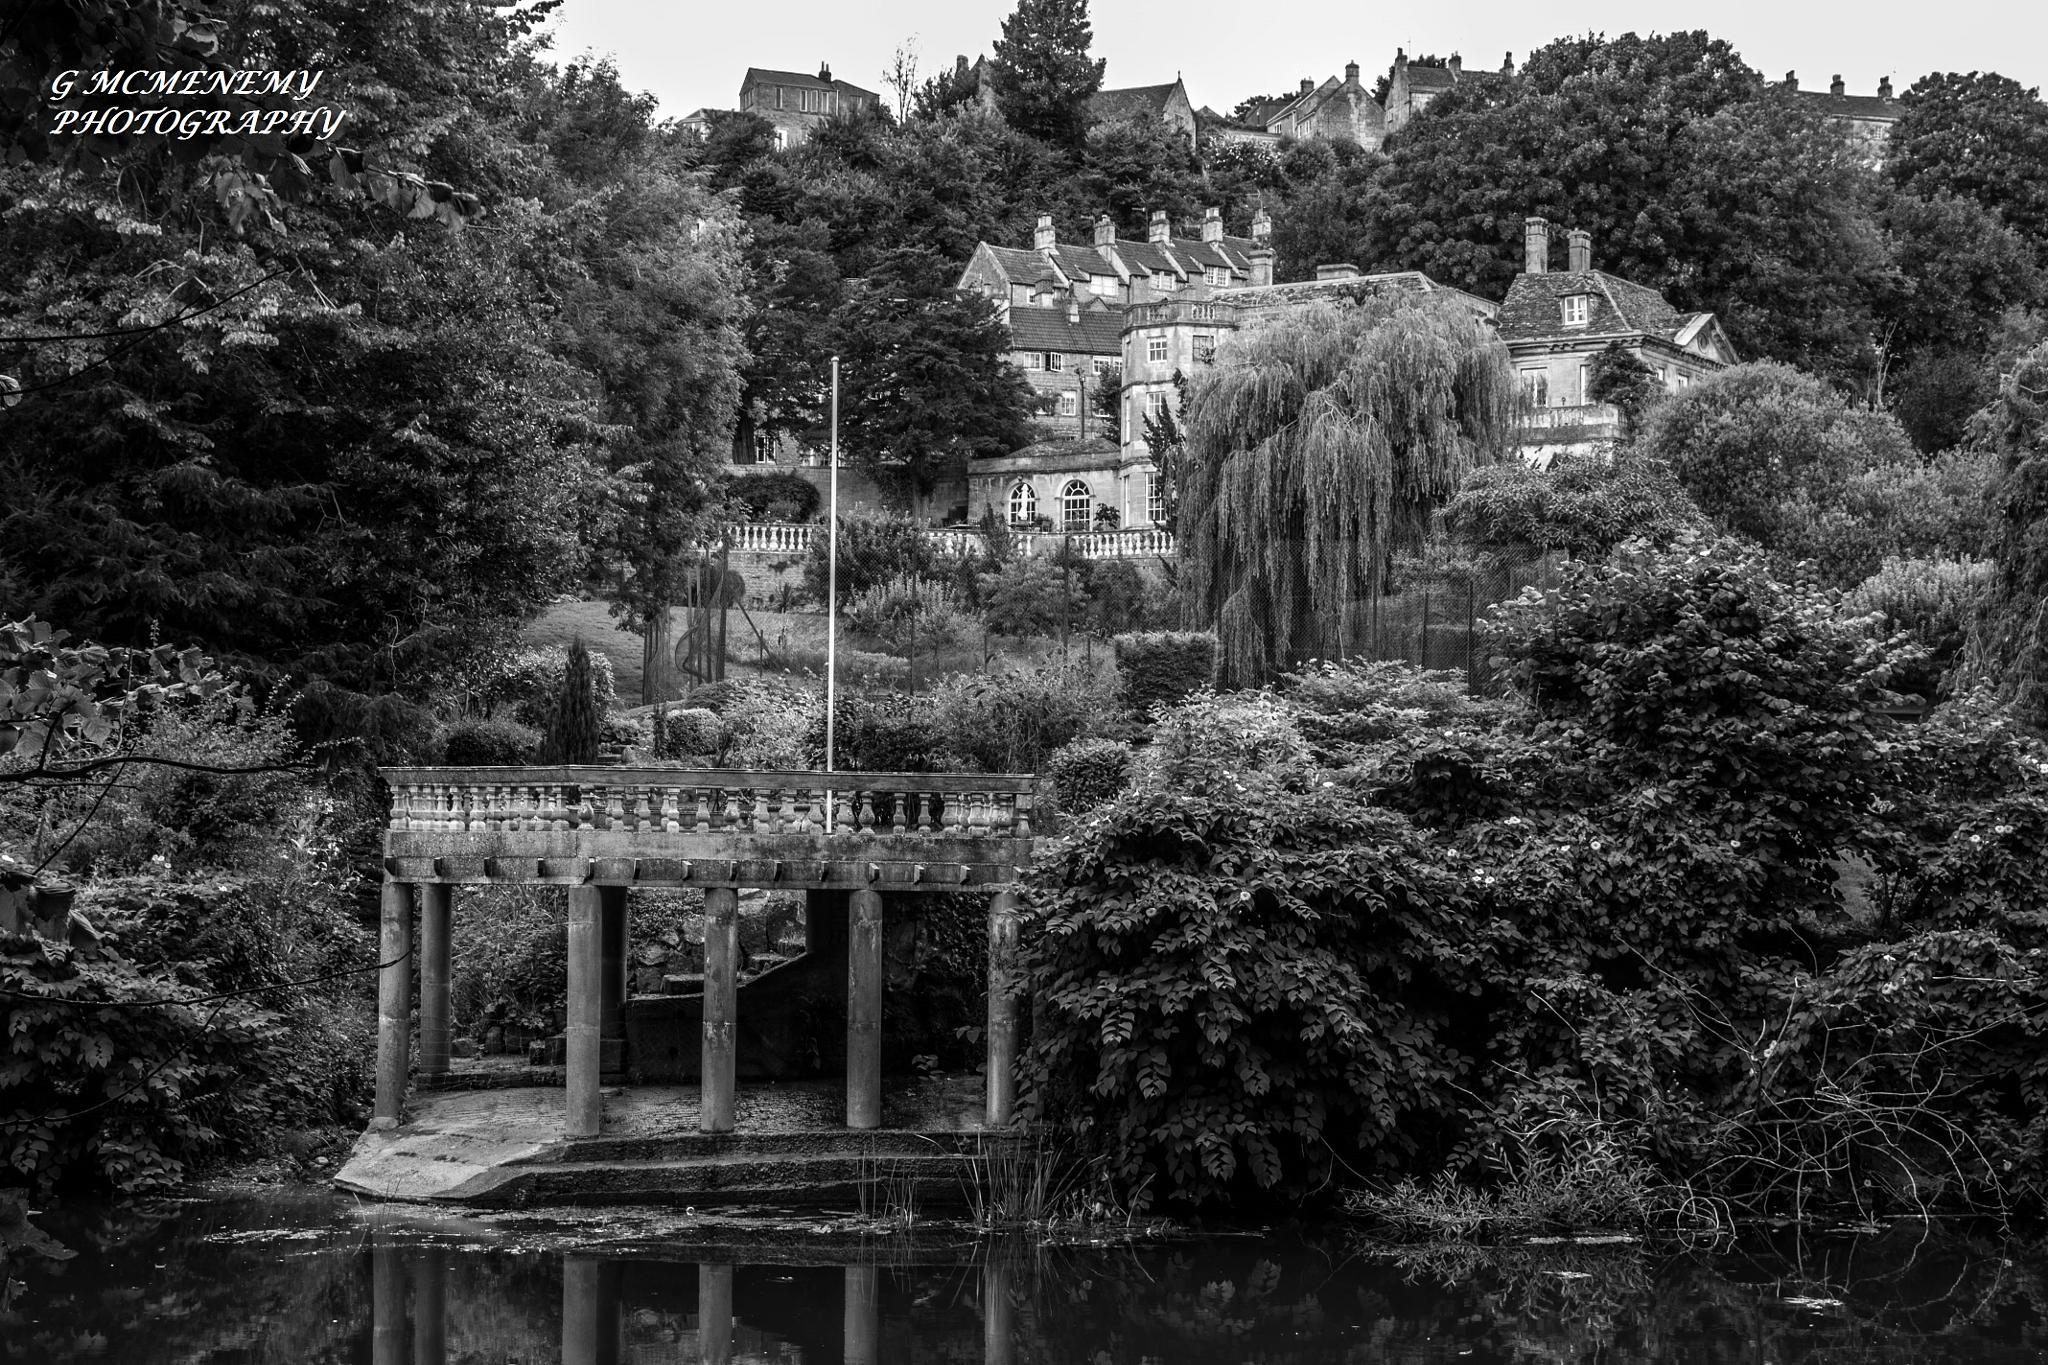 River Avon View by george.mcmenemy.7